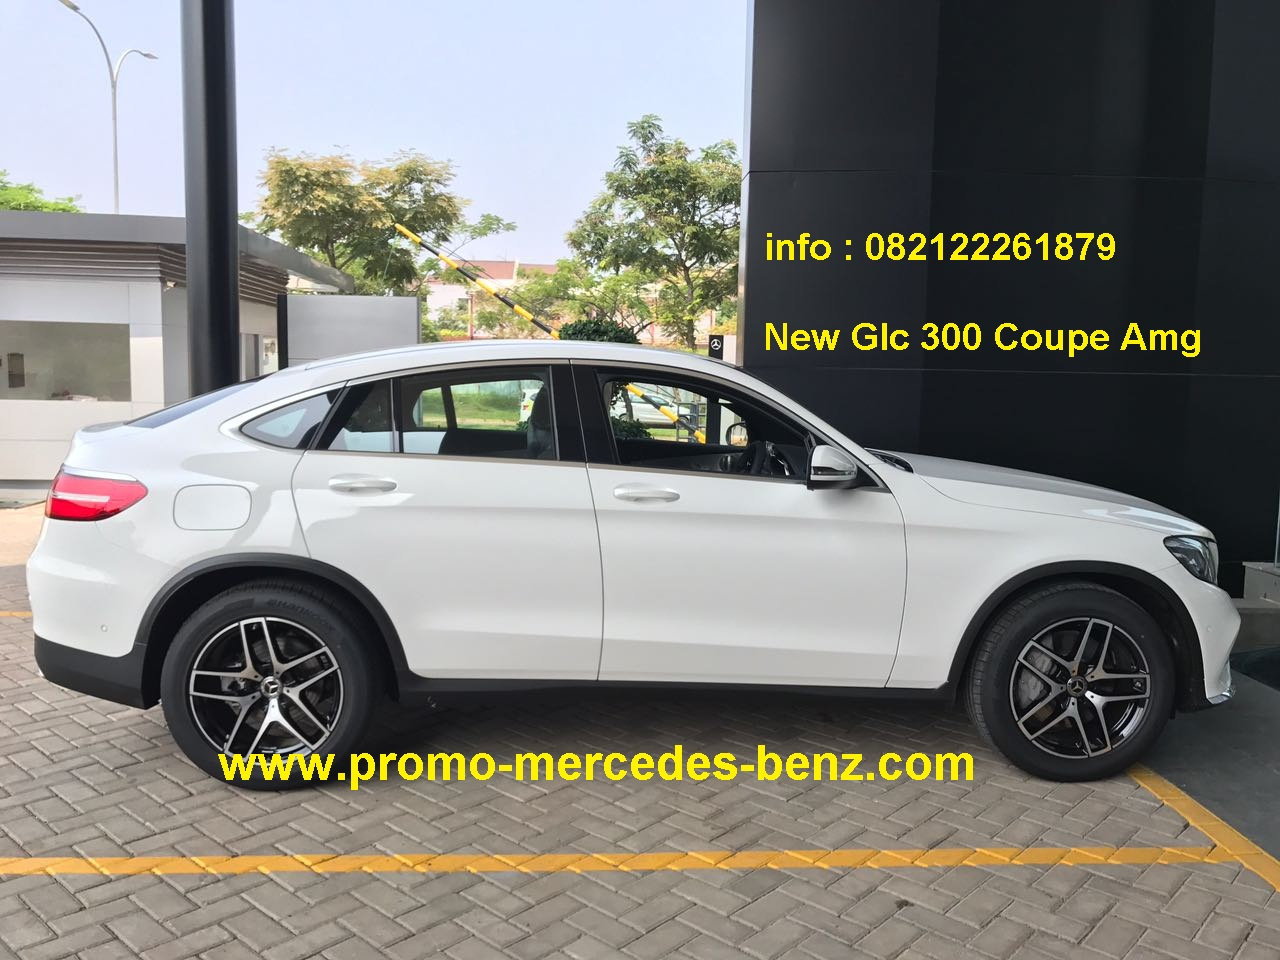 Harga Mercedes Benz Jakarta Bogor Depok Tangerang